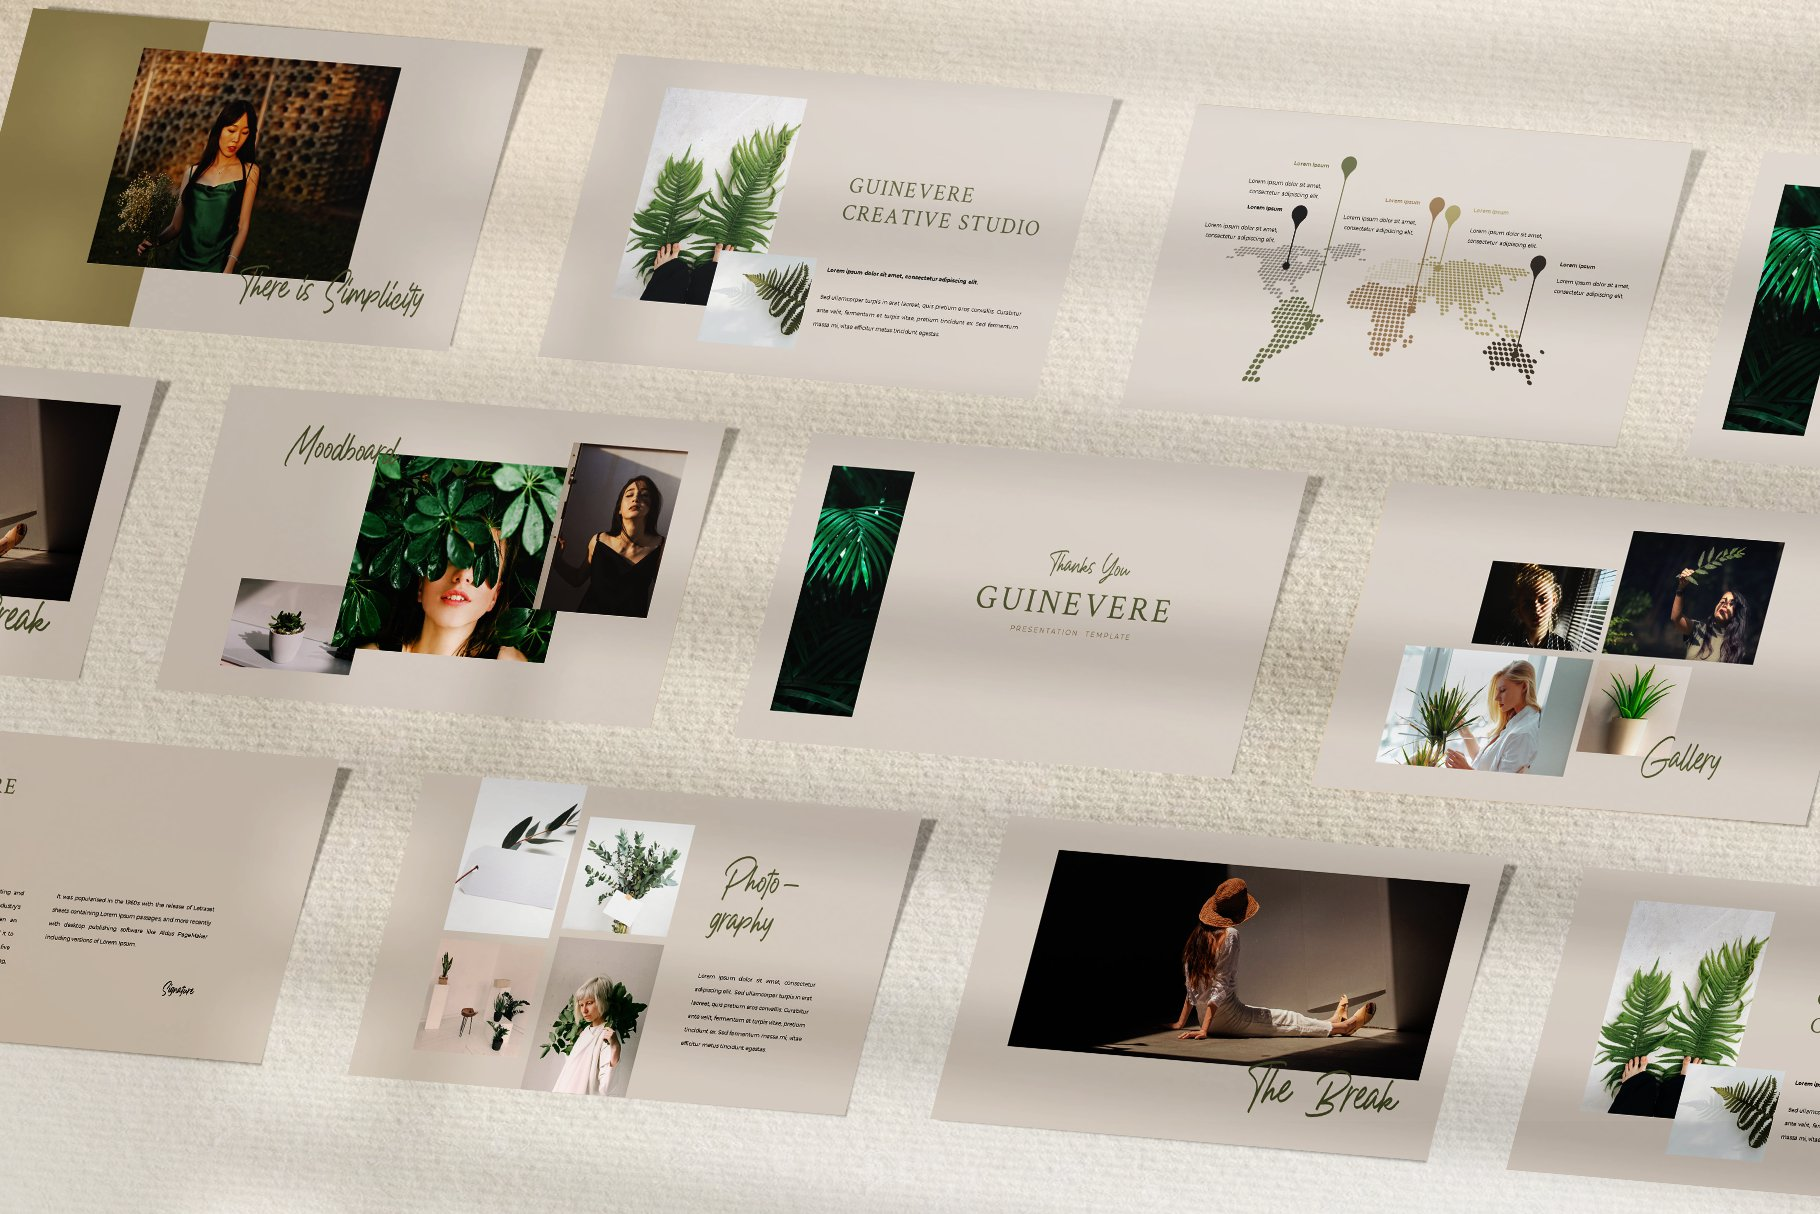 时尚品牌摄影作品集营销PPT幻灯片设计模板 Guinevere Presentation Template插图(3)